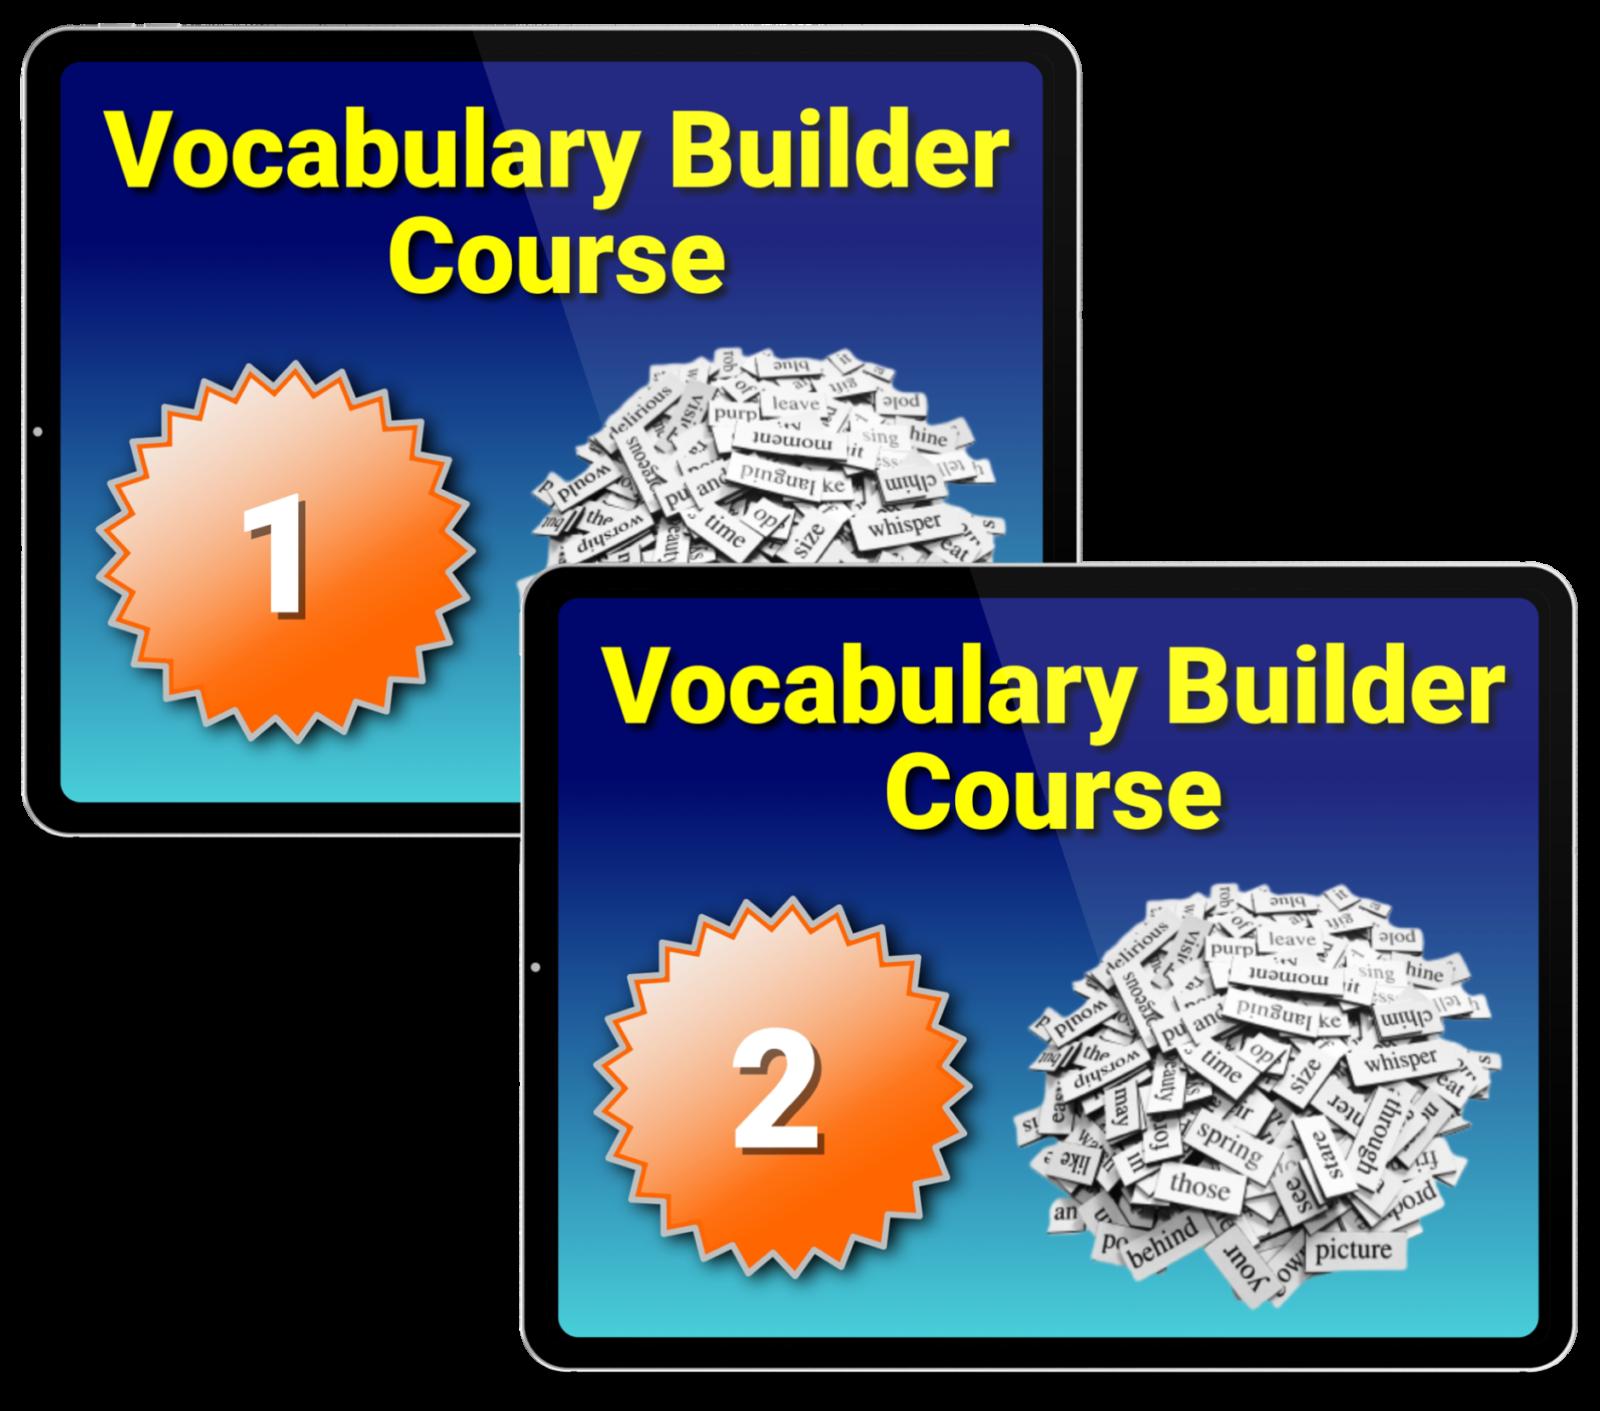 English Vocabulary Courses